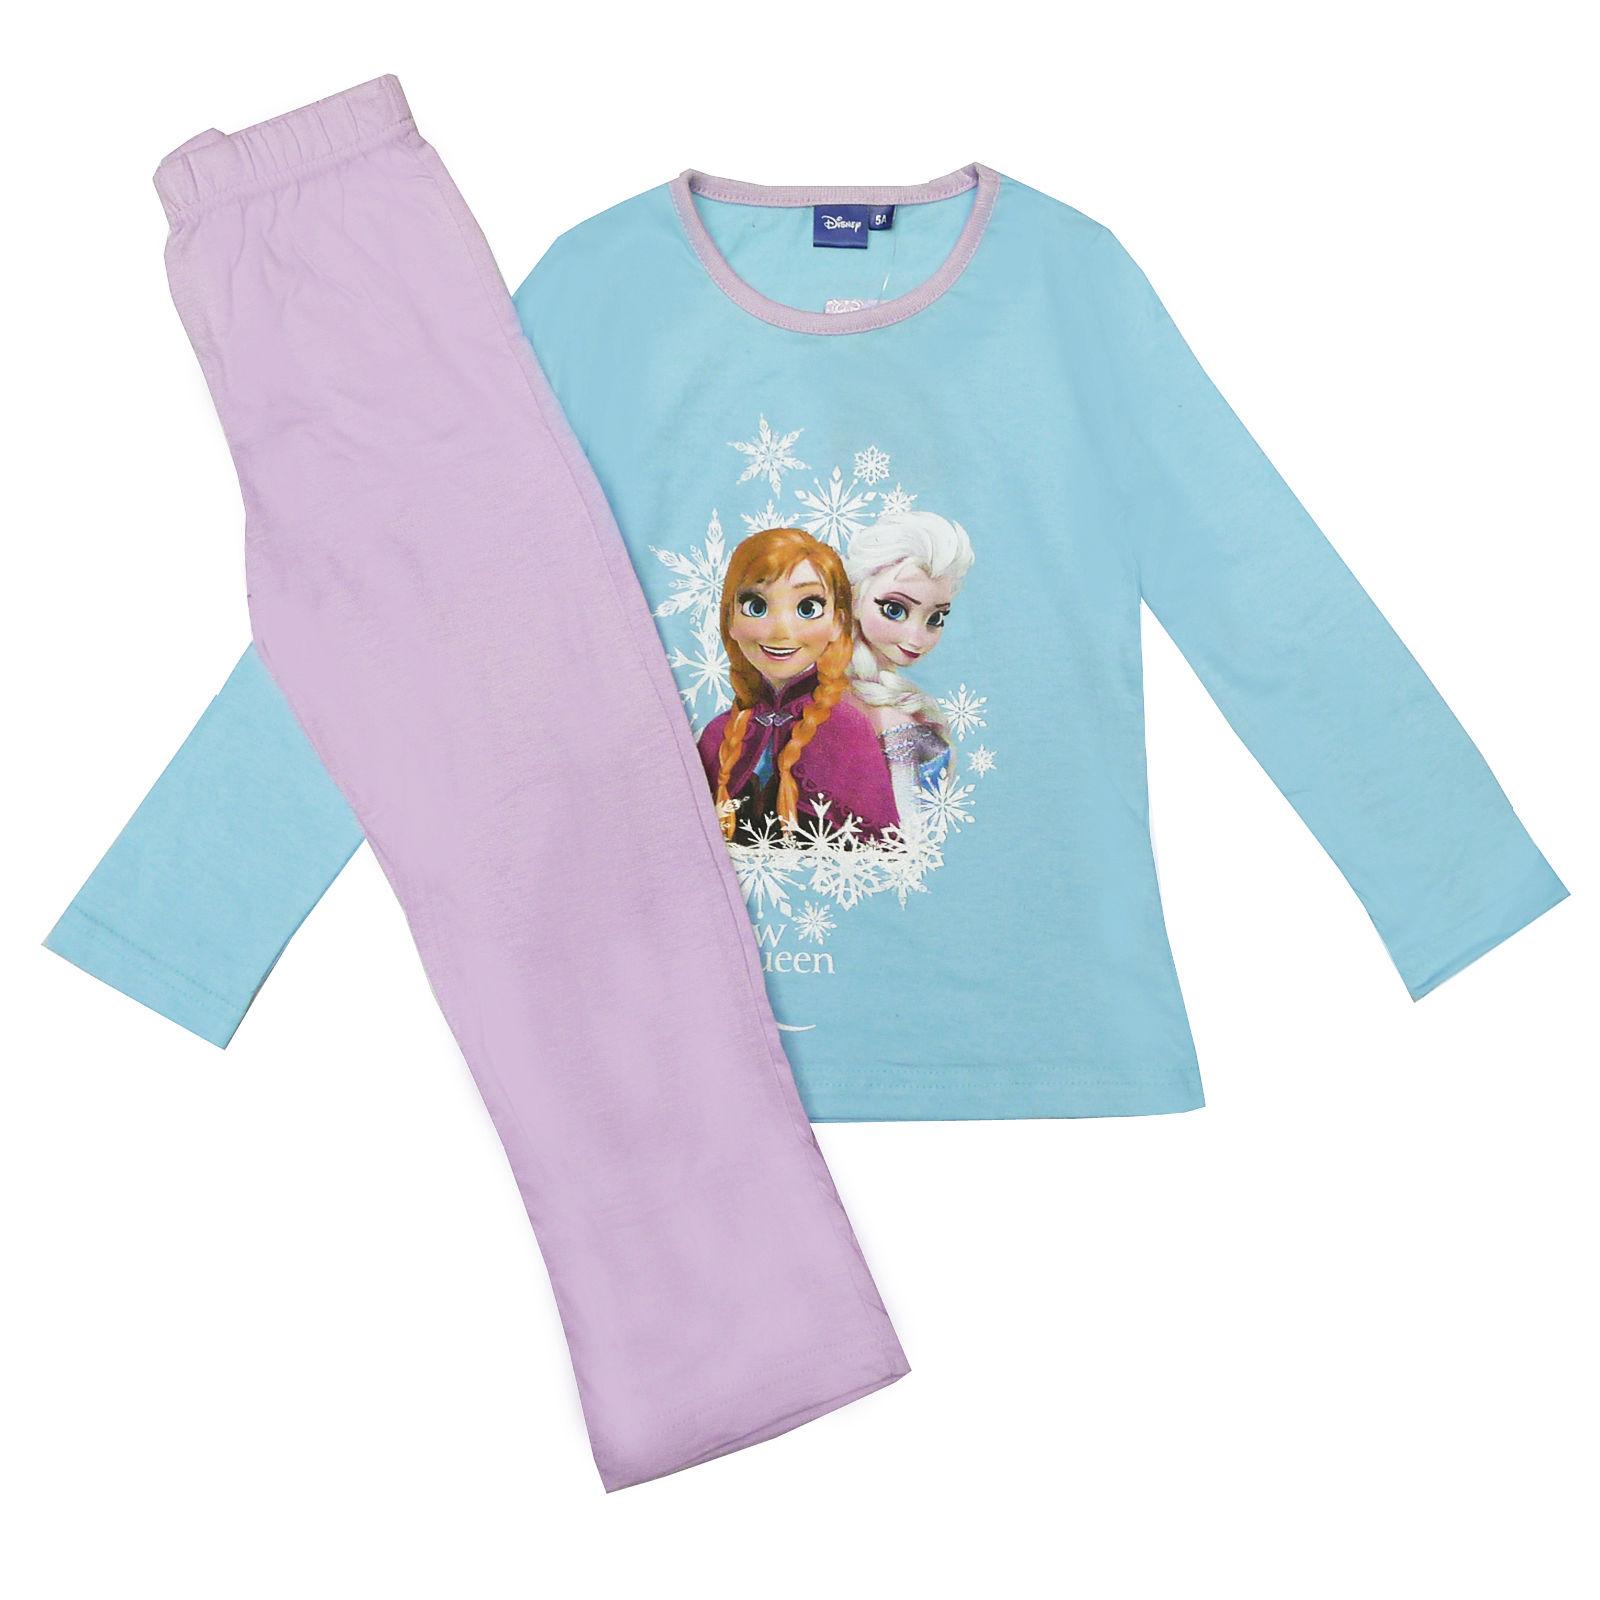 Official-Disney-Frozen-Elsa-Anna-Olaf-Childrens-Pyjama-Sets-amp-Long-Sleeved-Tops thumbnail 10